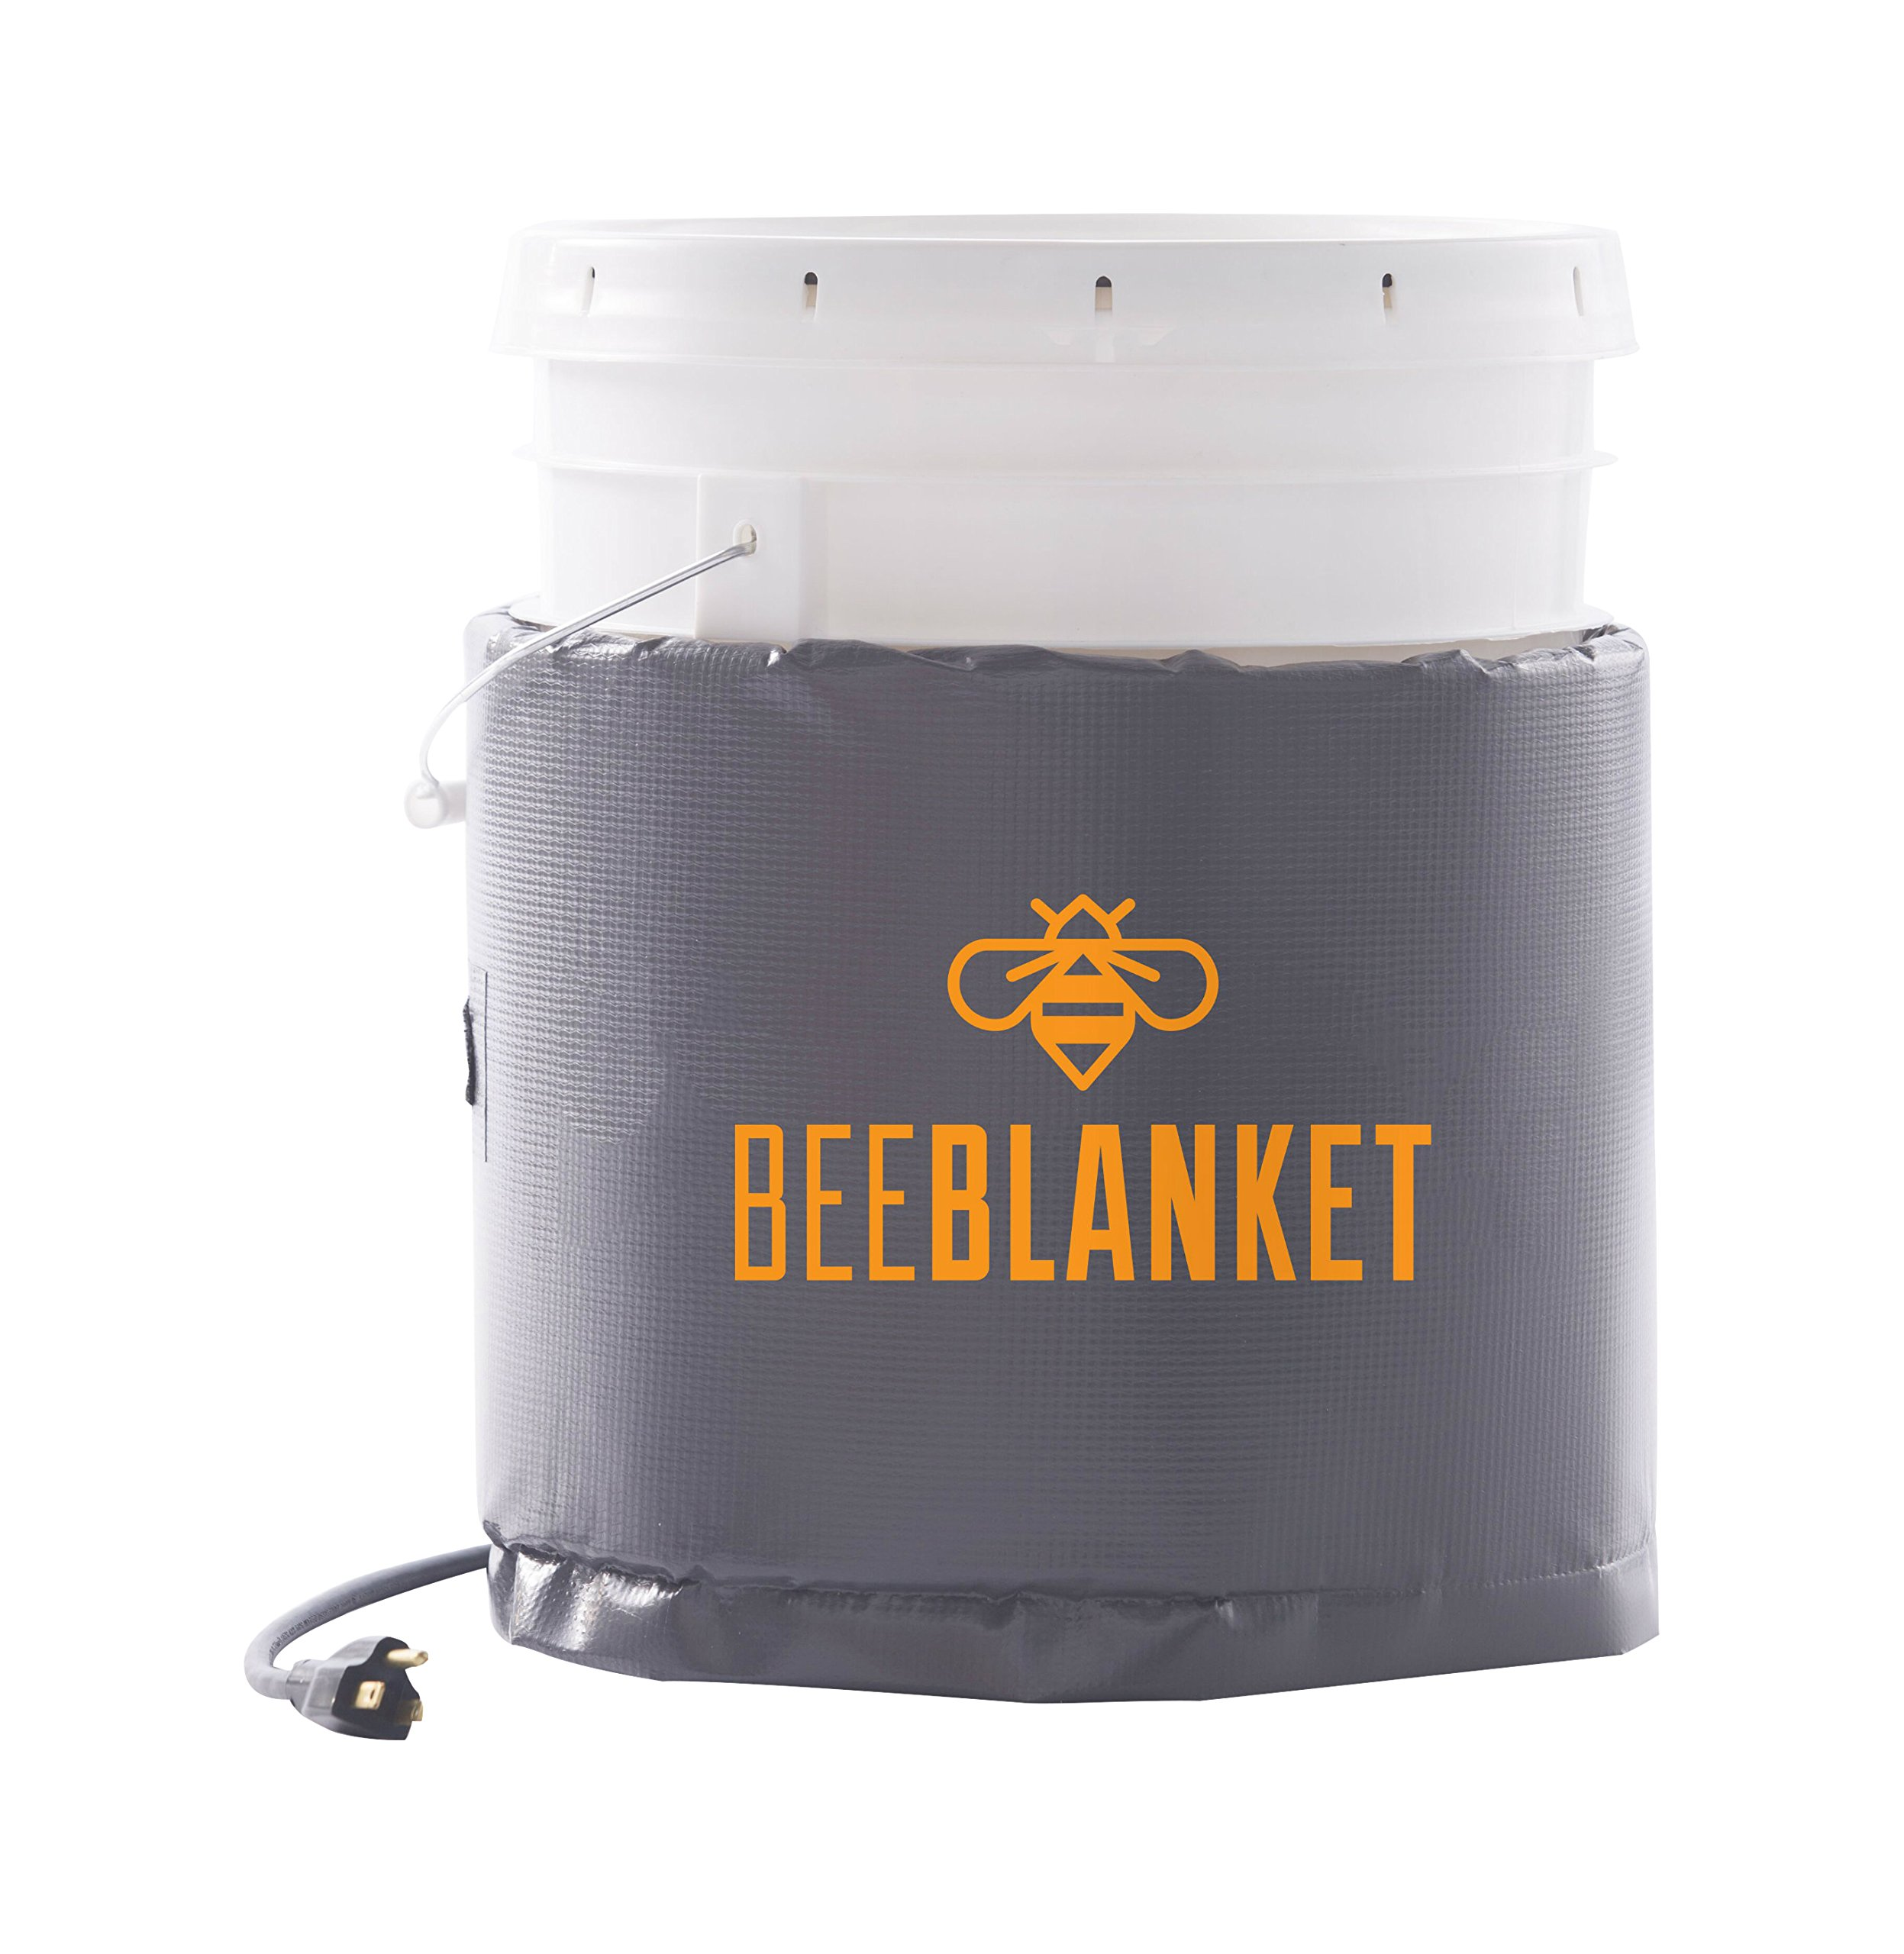 Powerblanket BB05 Bee Blanket 5 gal Pail Heater, Honey/Bucket, 120W, 120V